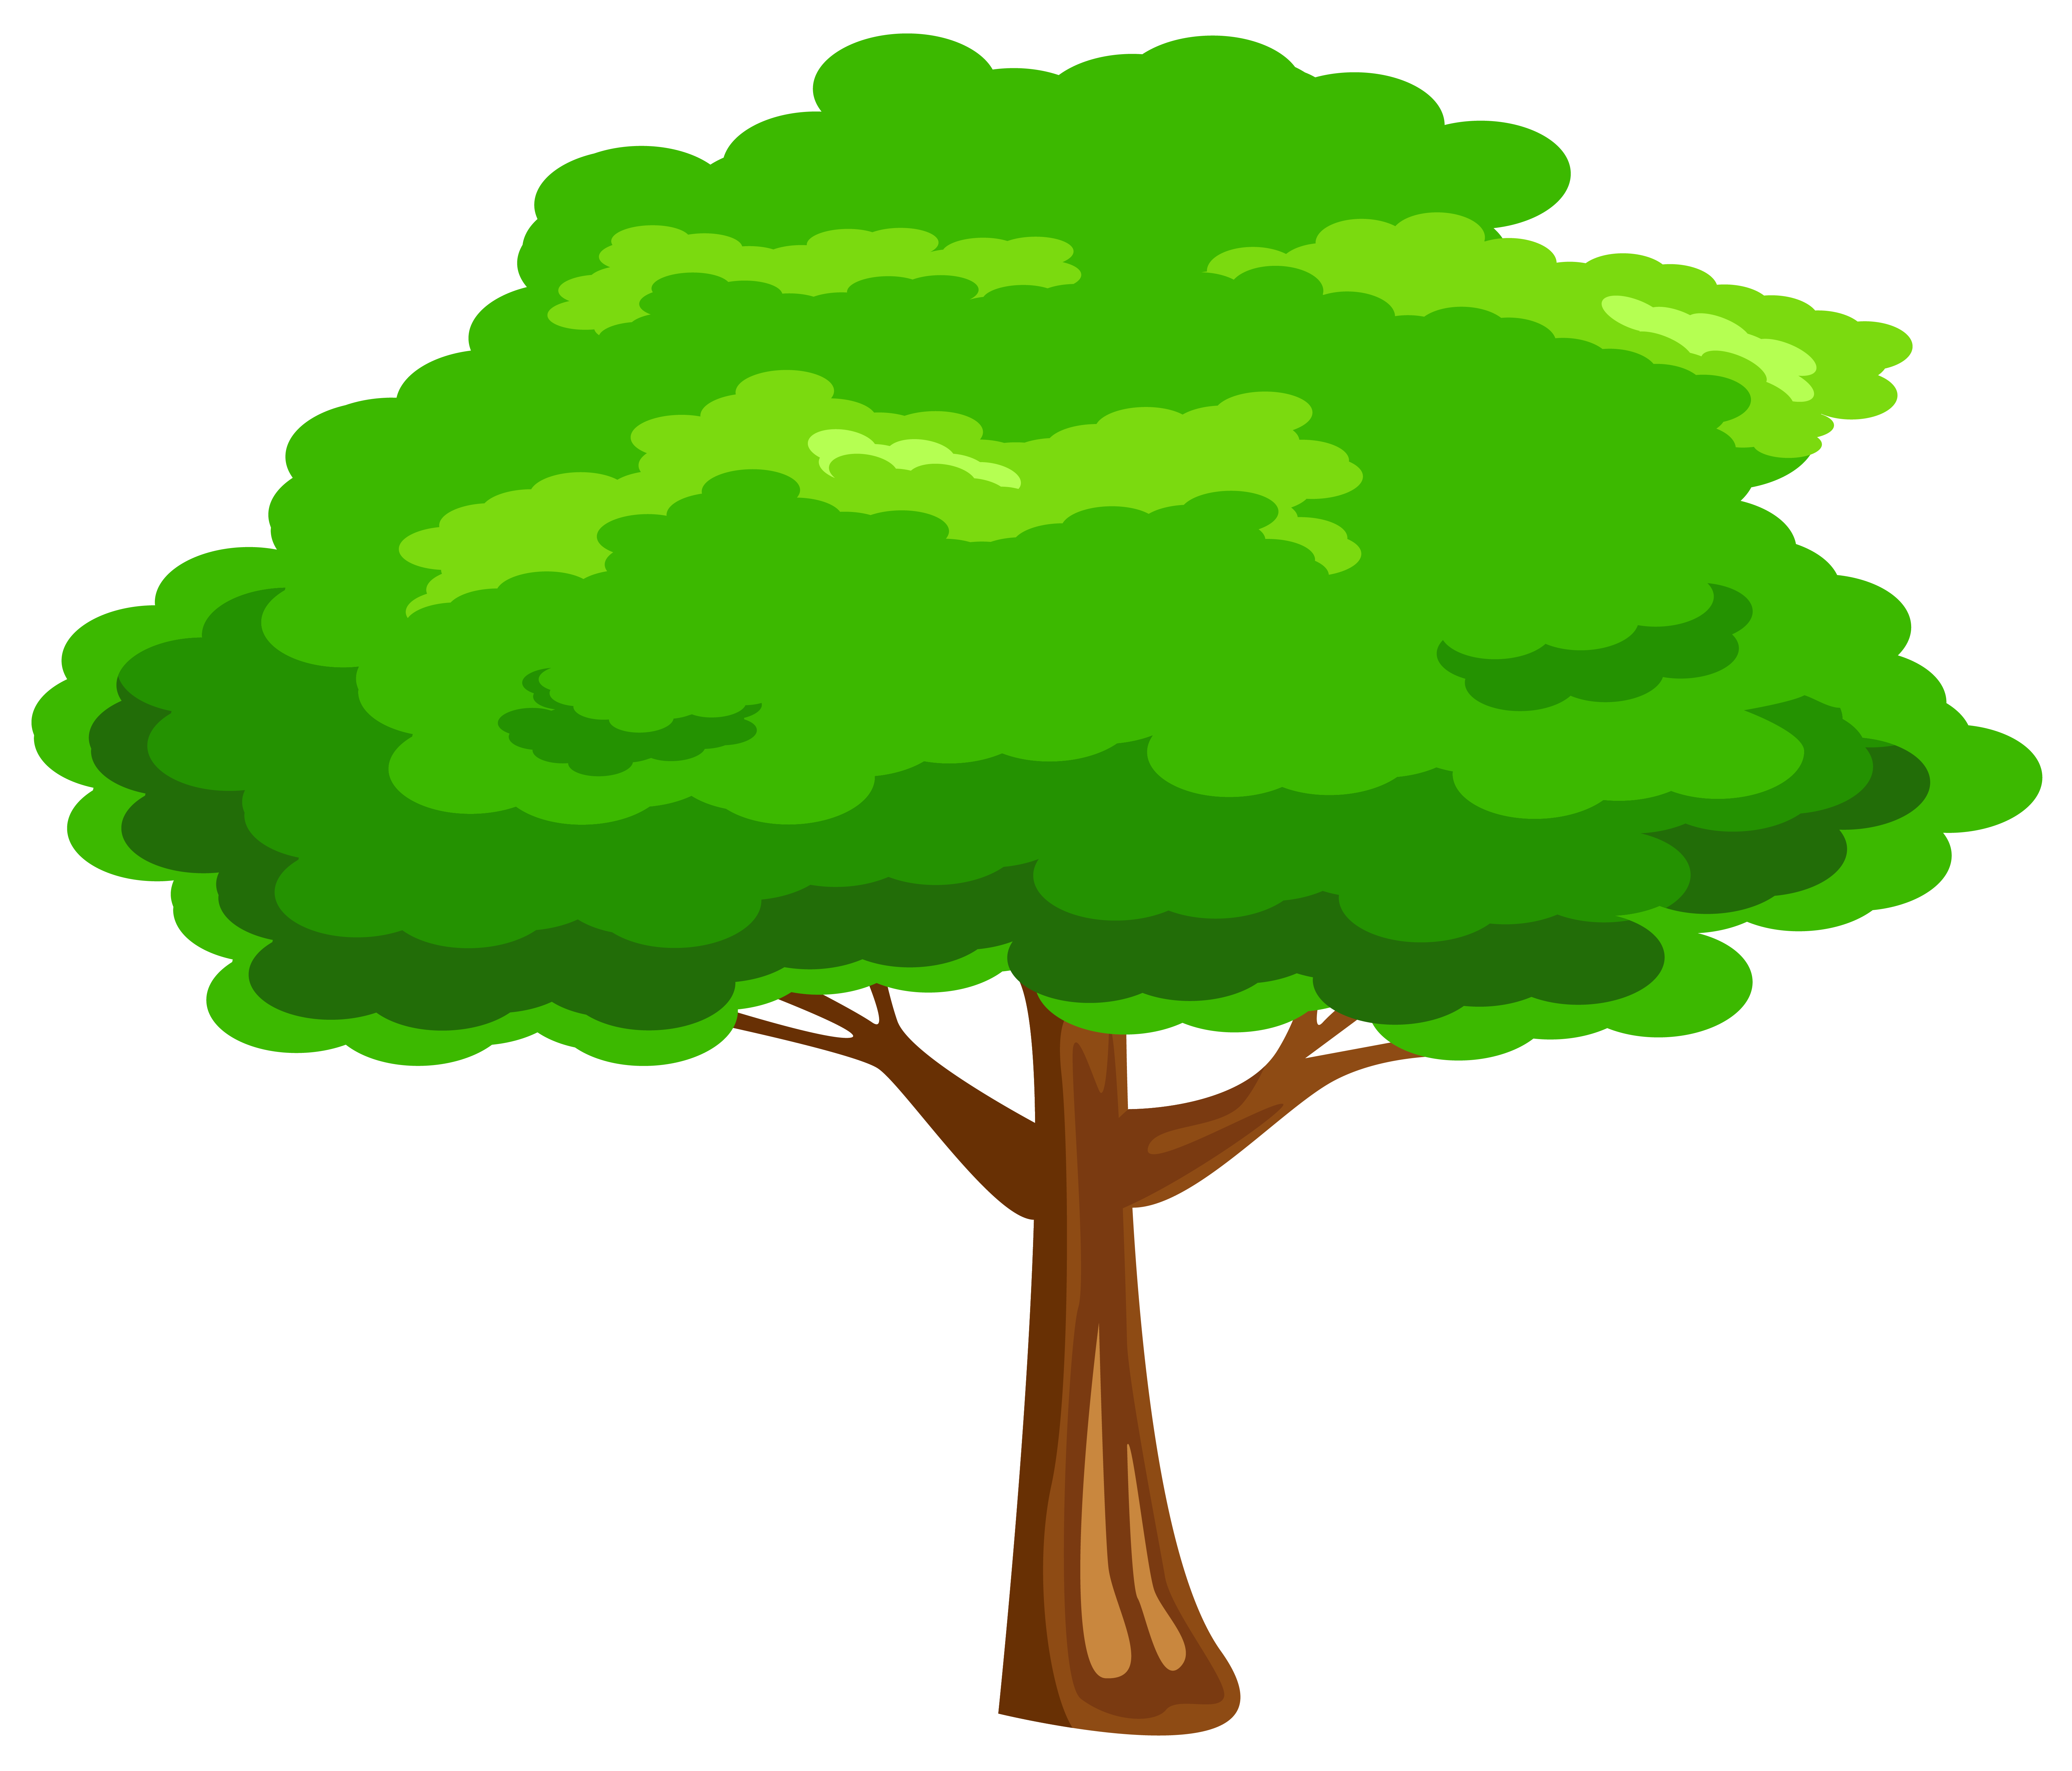 6312x5396 Tree Clipart Green Tree